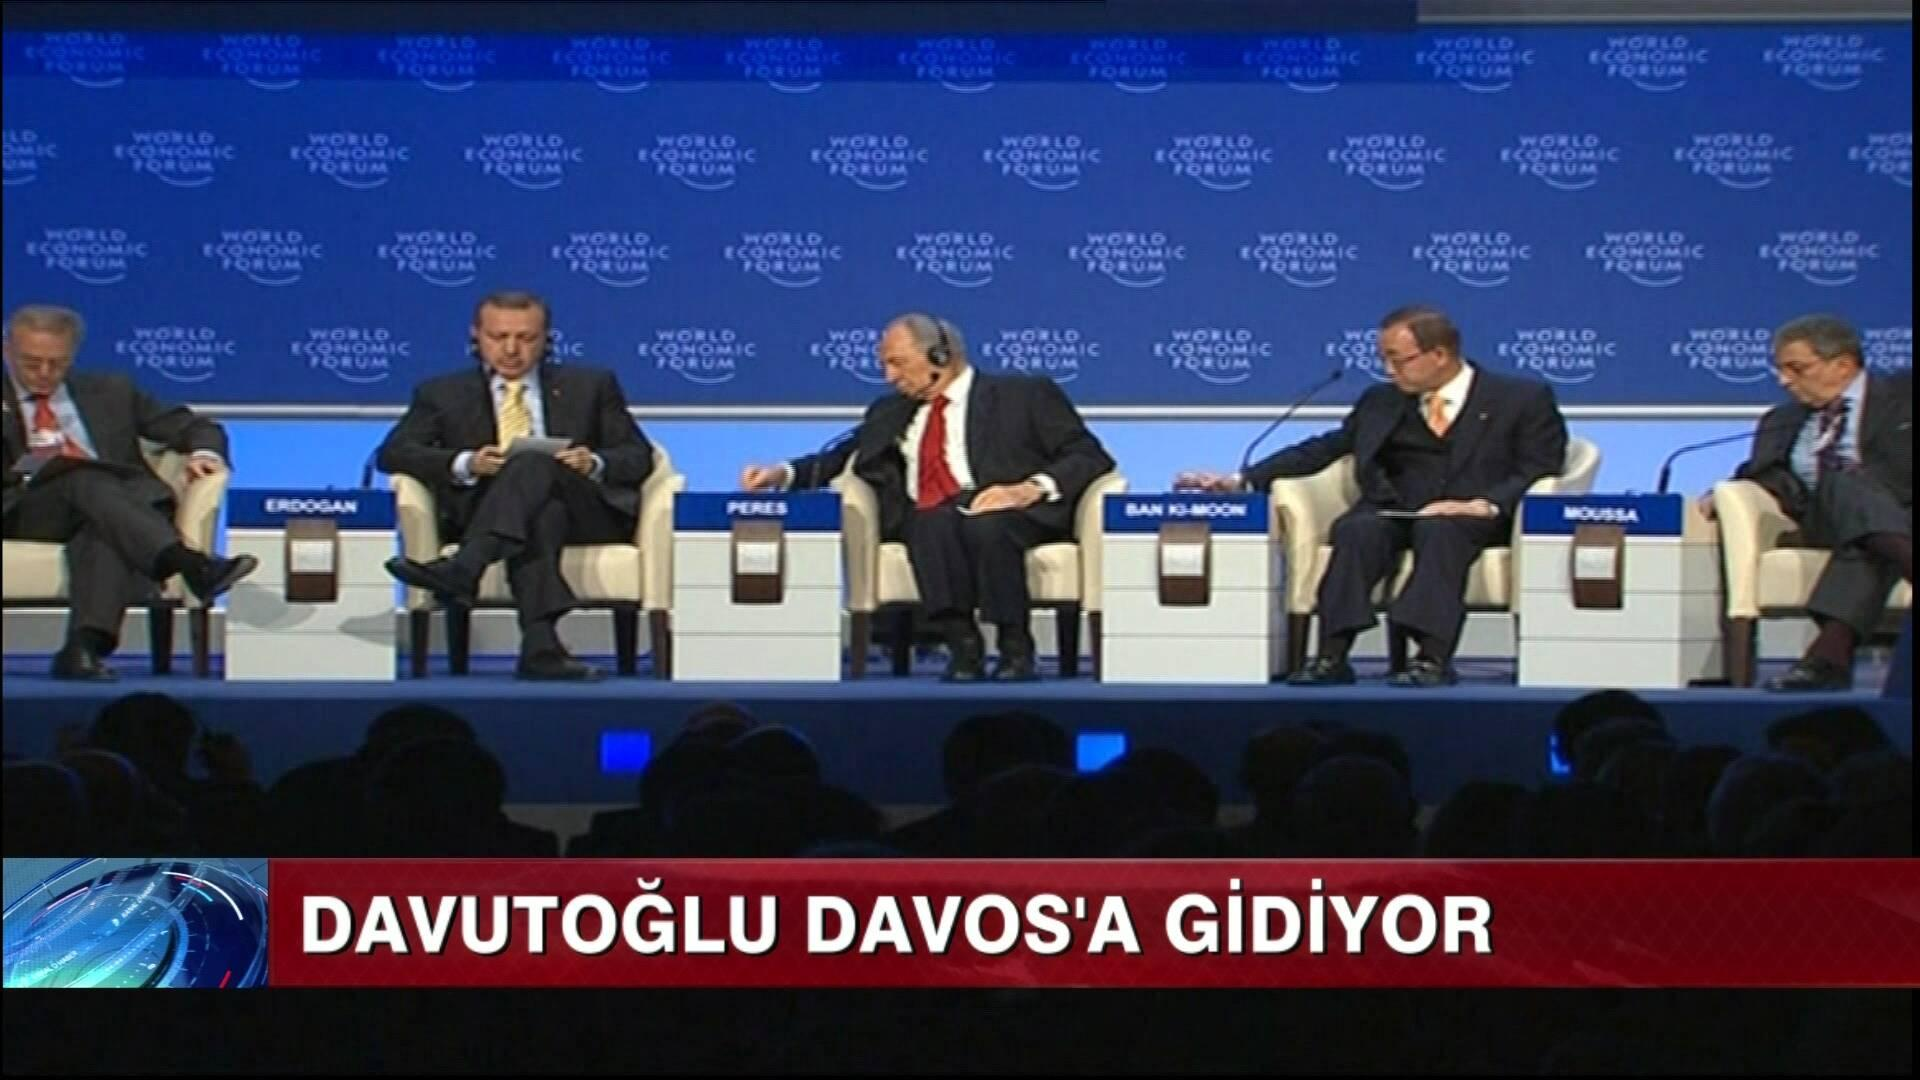 Davutoğlu, Davos'a gidiyor!